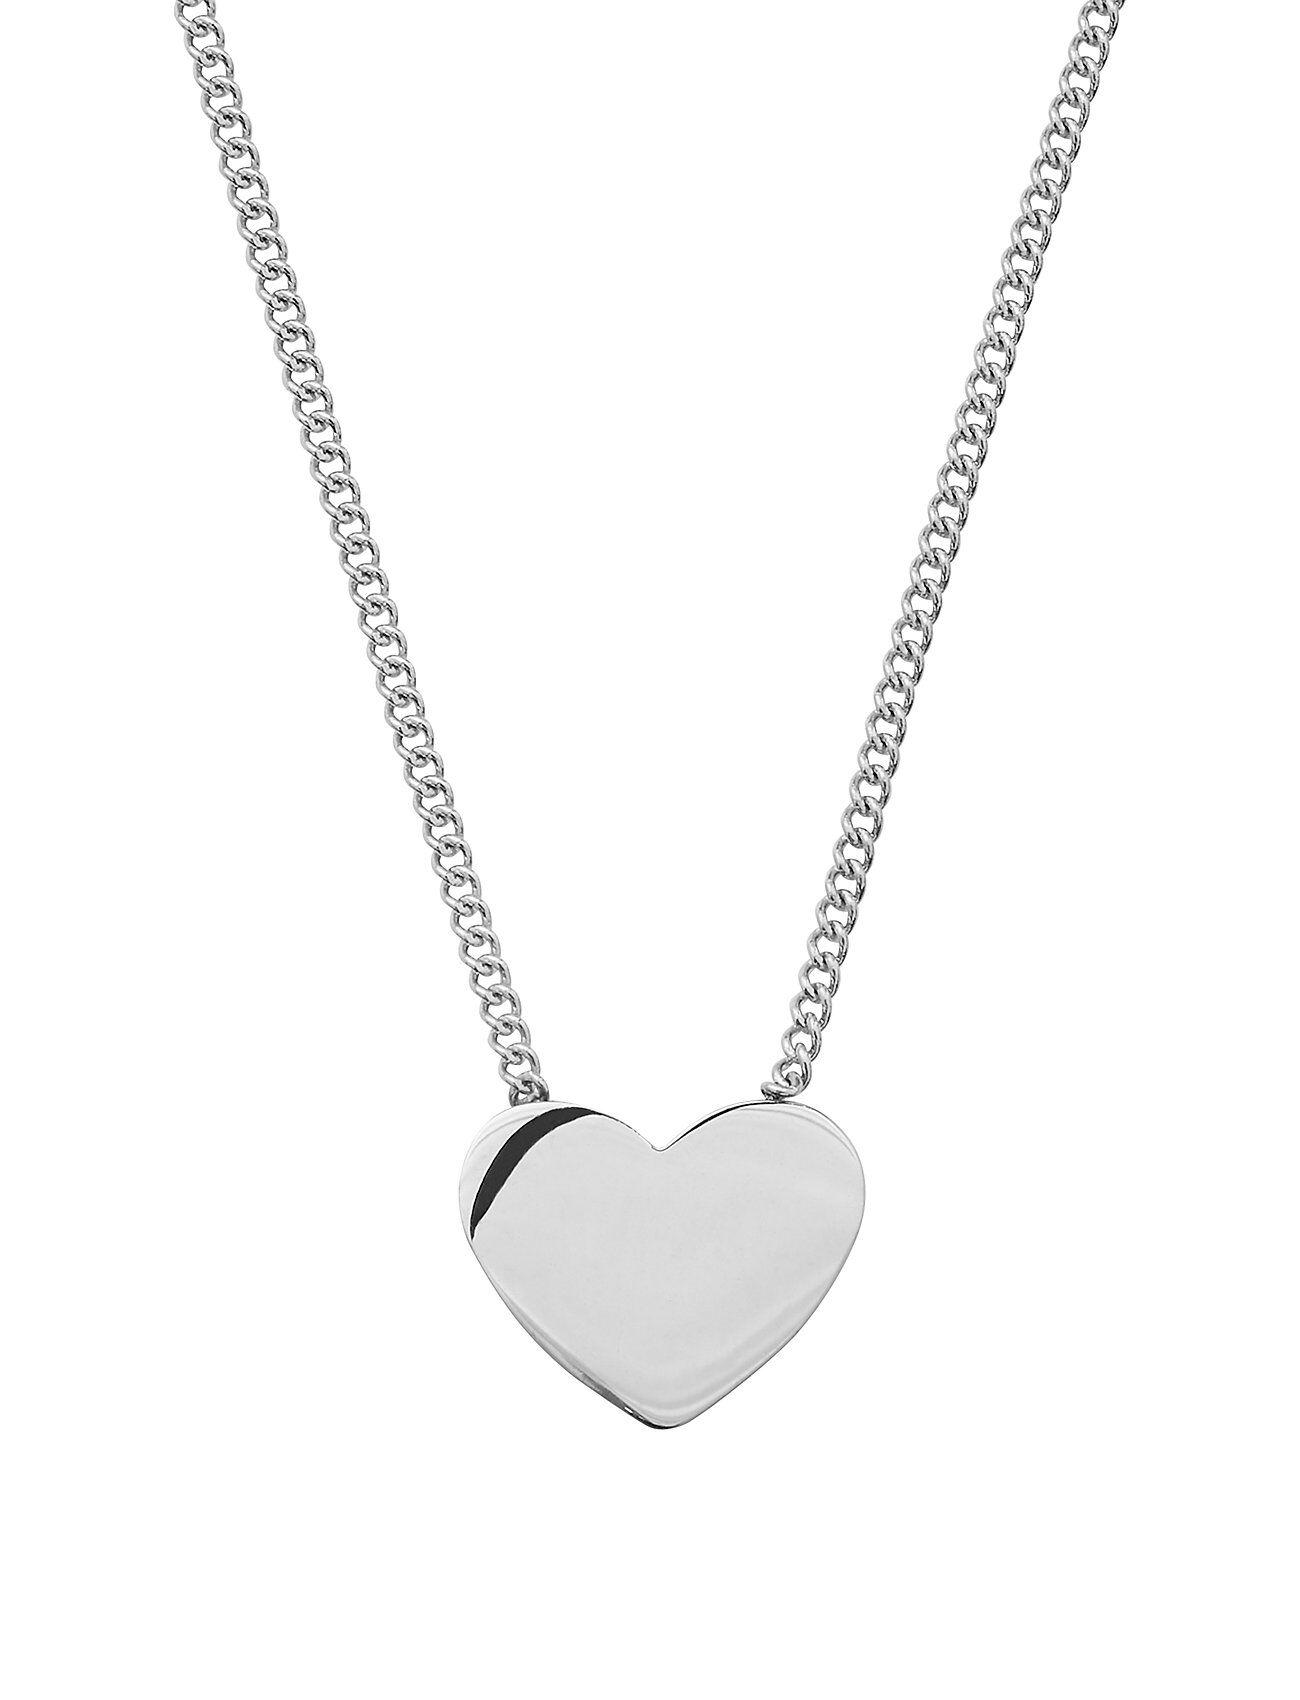 Edblad Pure Heart Necklace Steel Accessories Jewellery Necklaces Dainty Necklaces Hopea Edblad